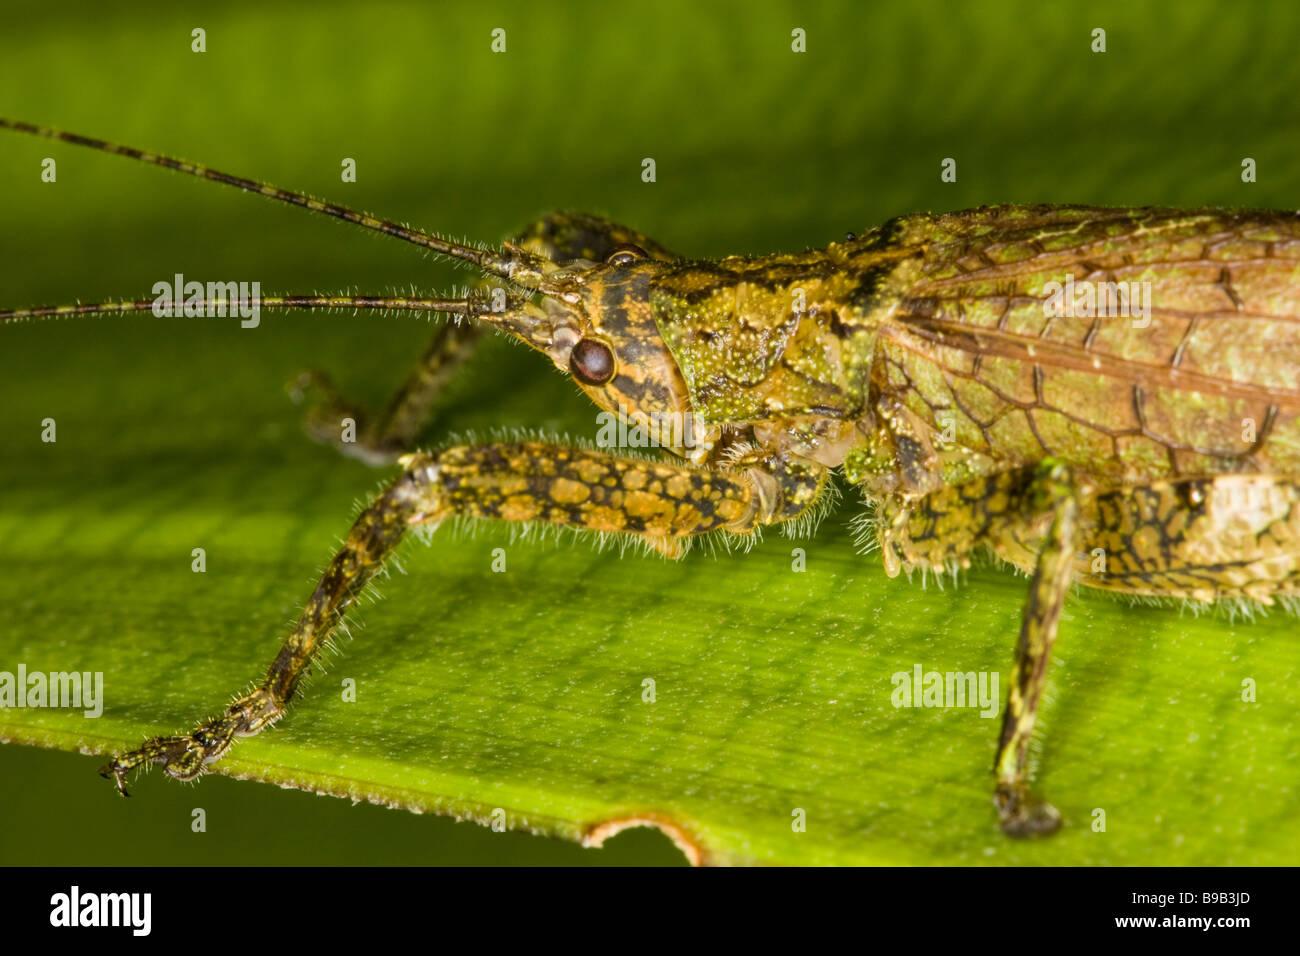 Nahaufnahme eines Bushcricket Flechten-imitieren oder Grashuepfer (Orthopteren: Tettigoniidae) Stockbild